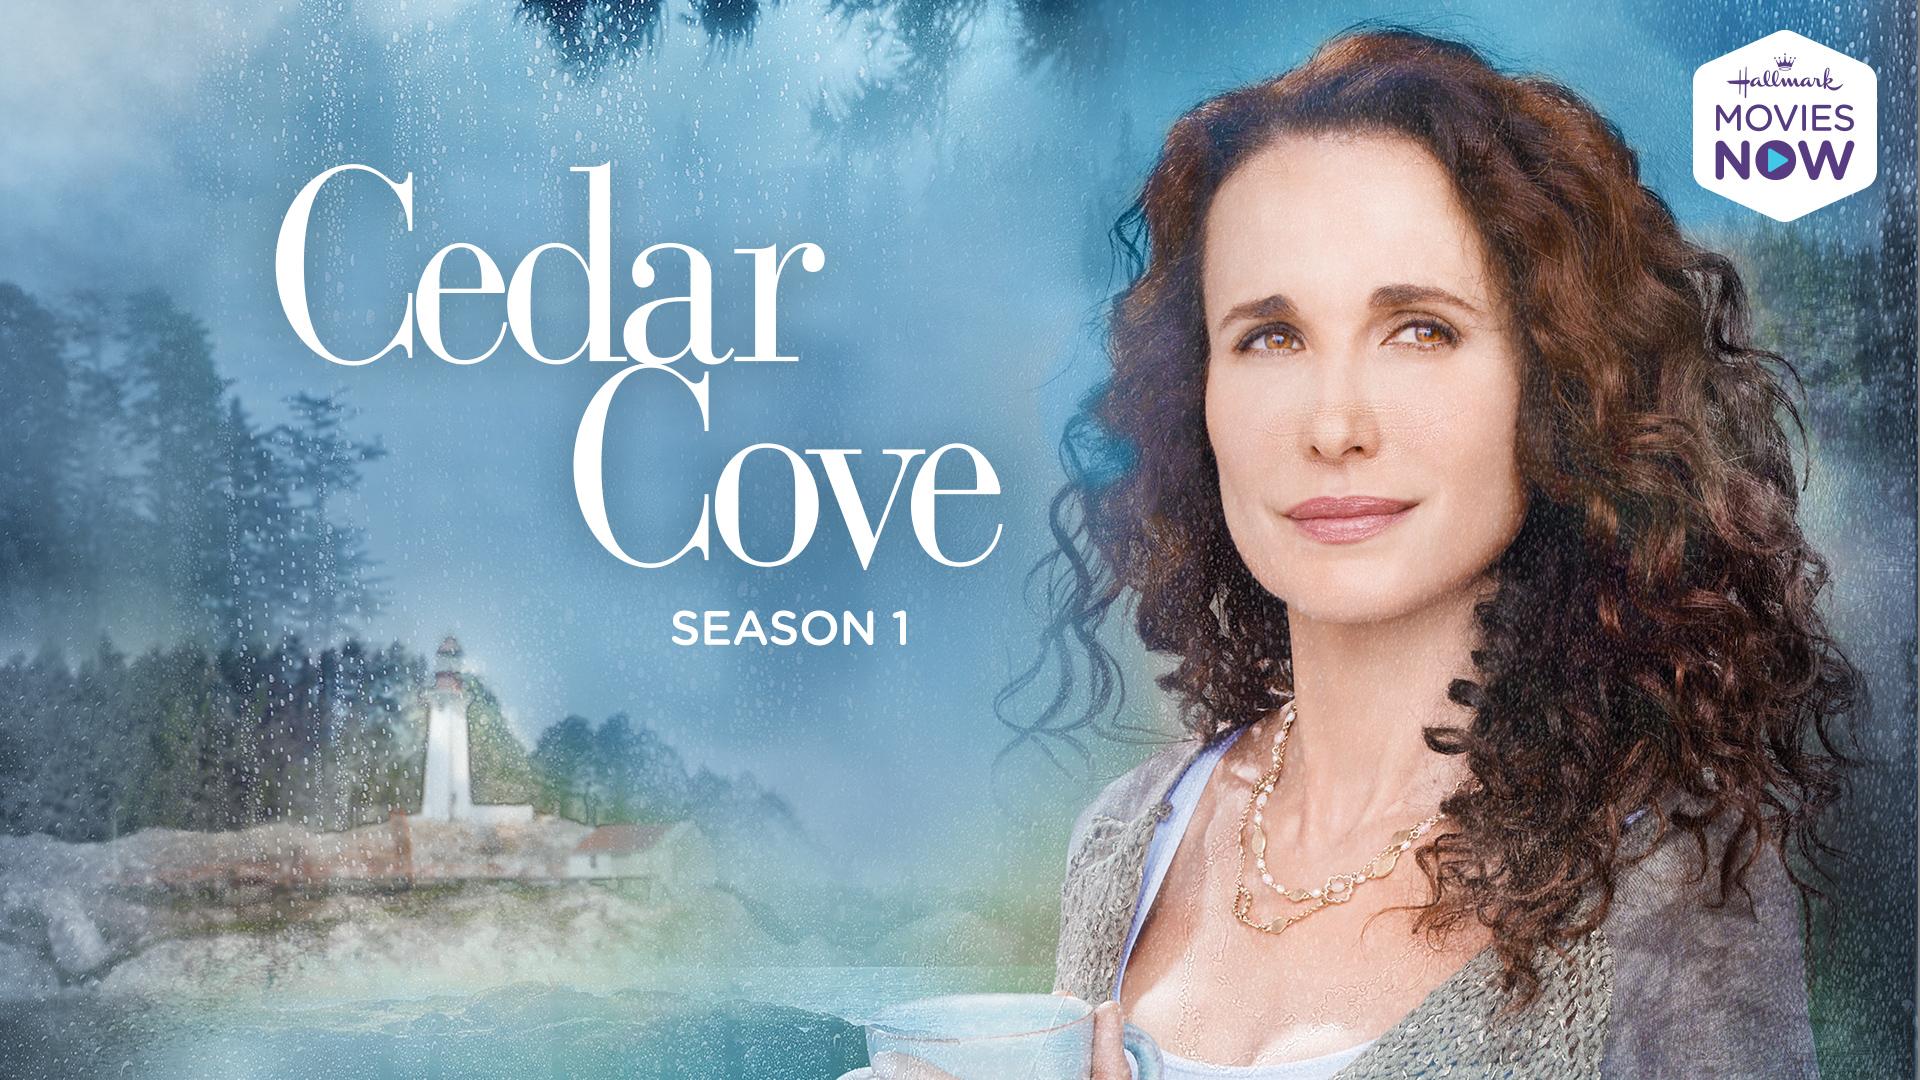 Cedar Cove Season 1